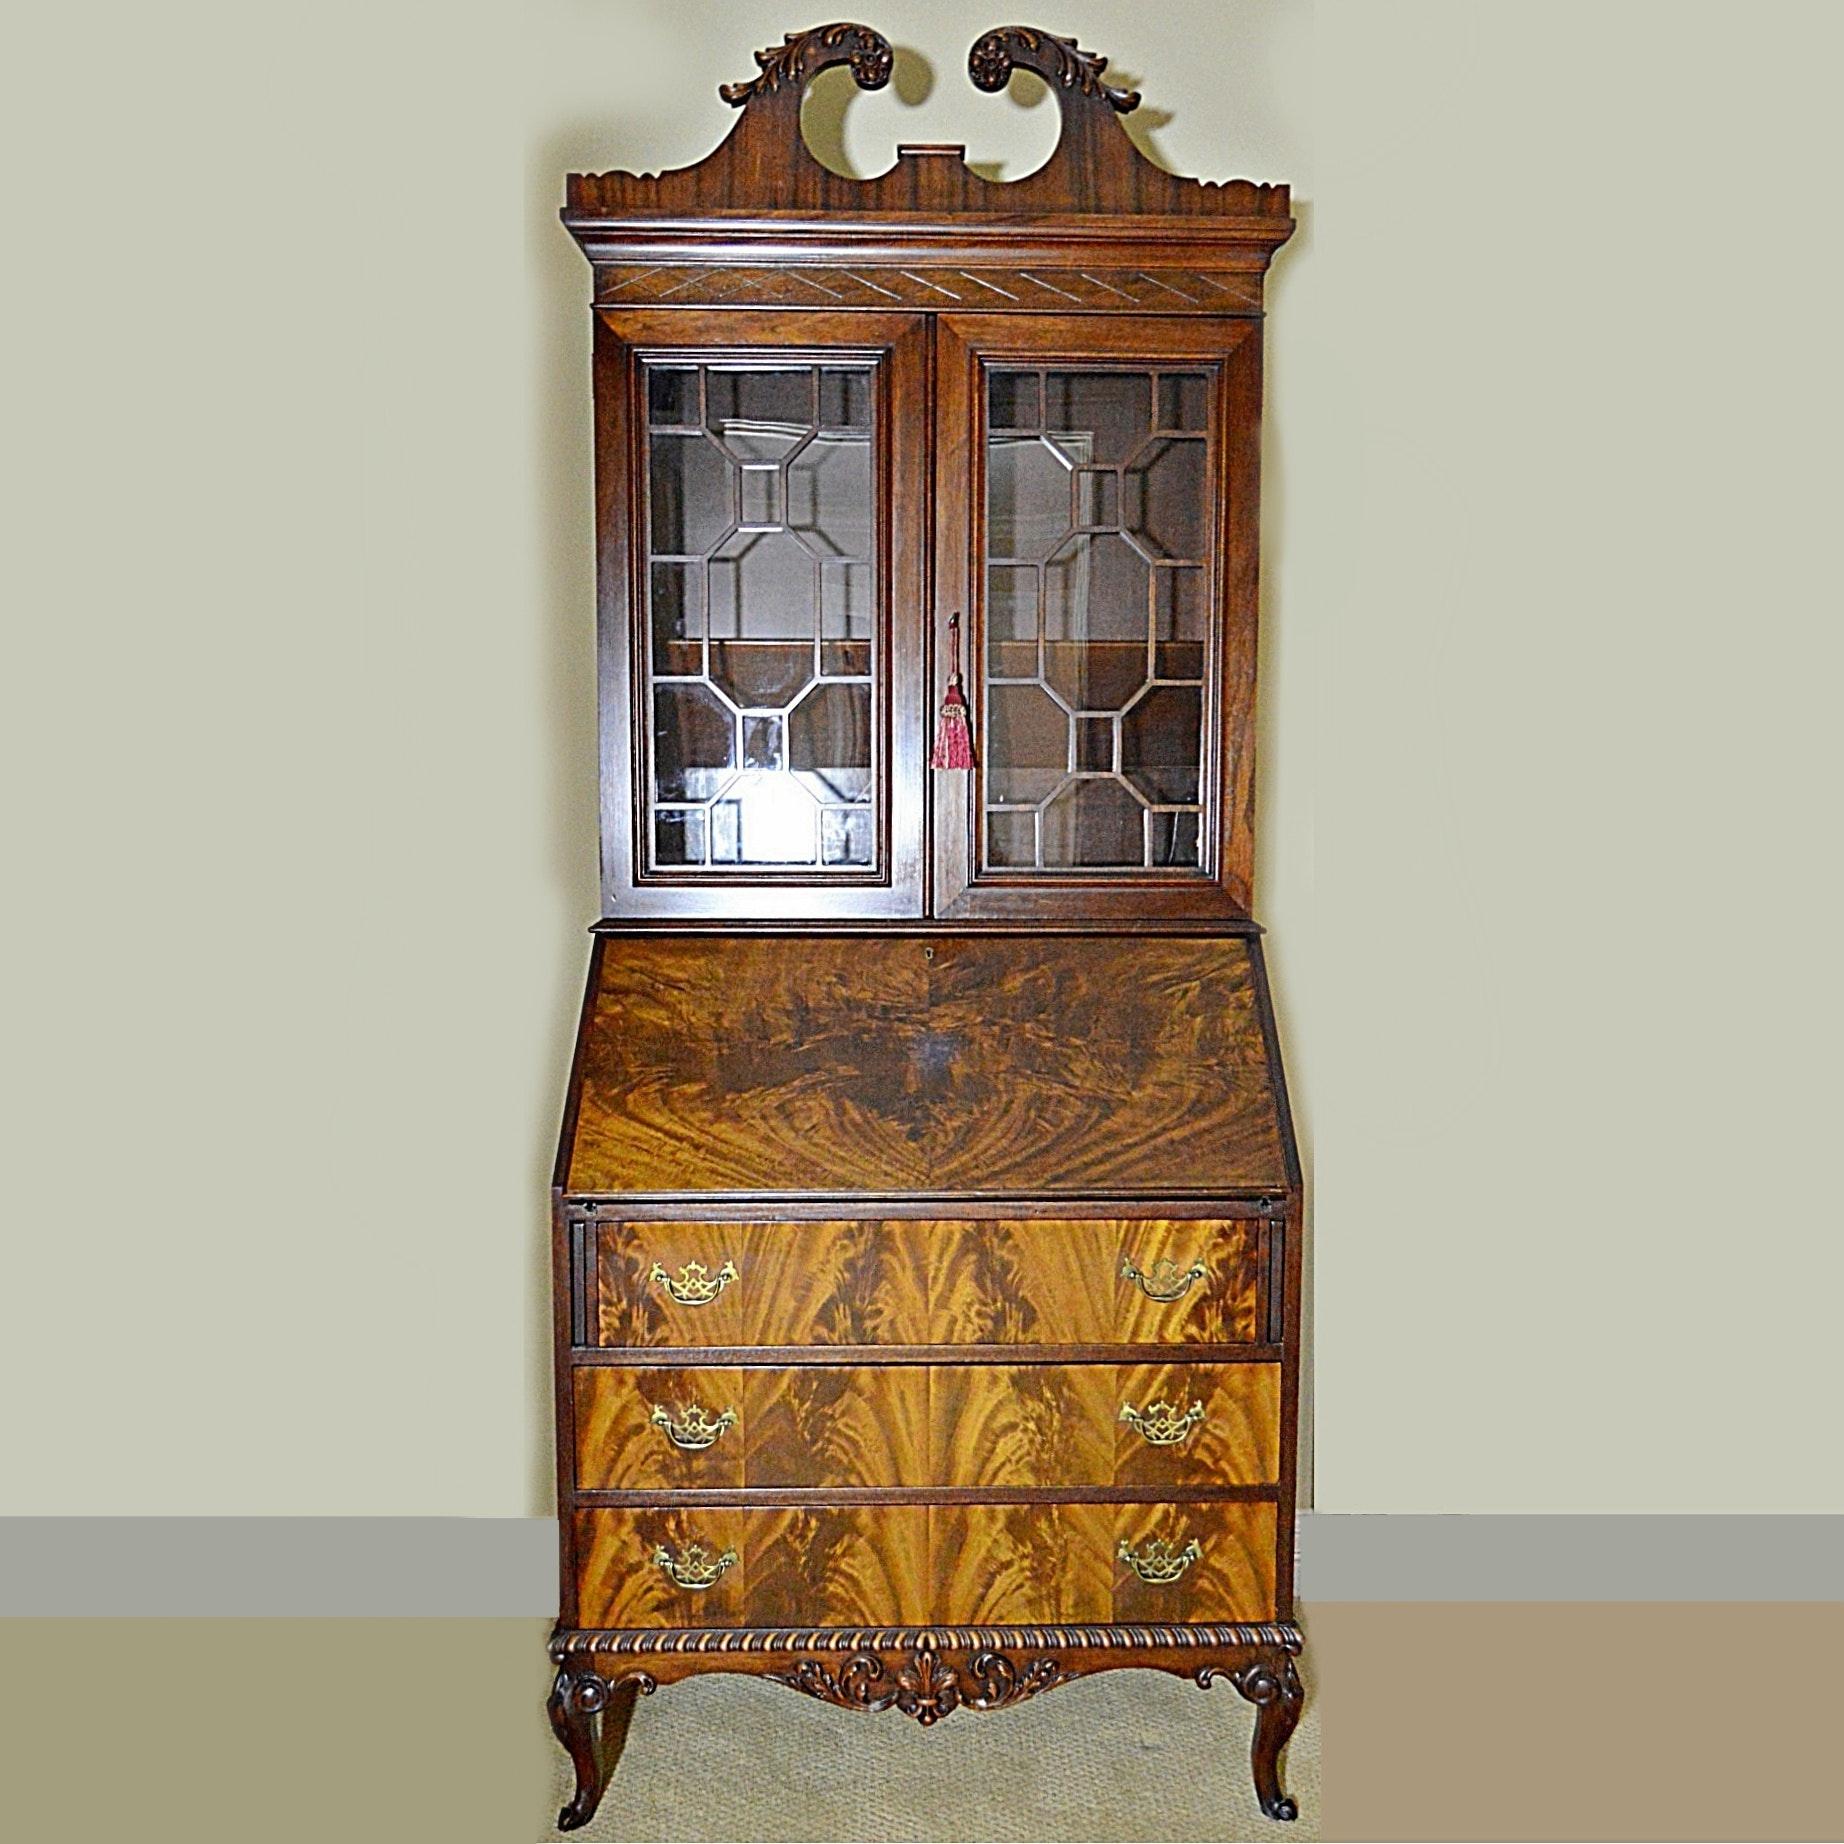 Vintage Louis XV Style Secretariat Cabinet in Flame Mahogany